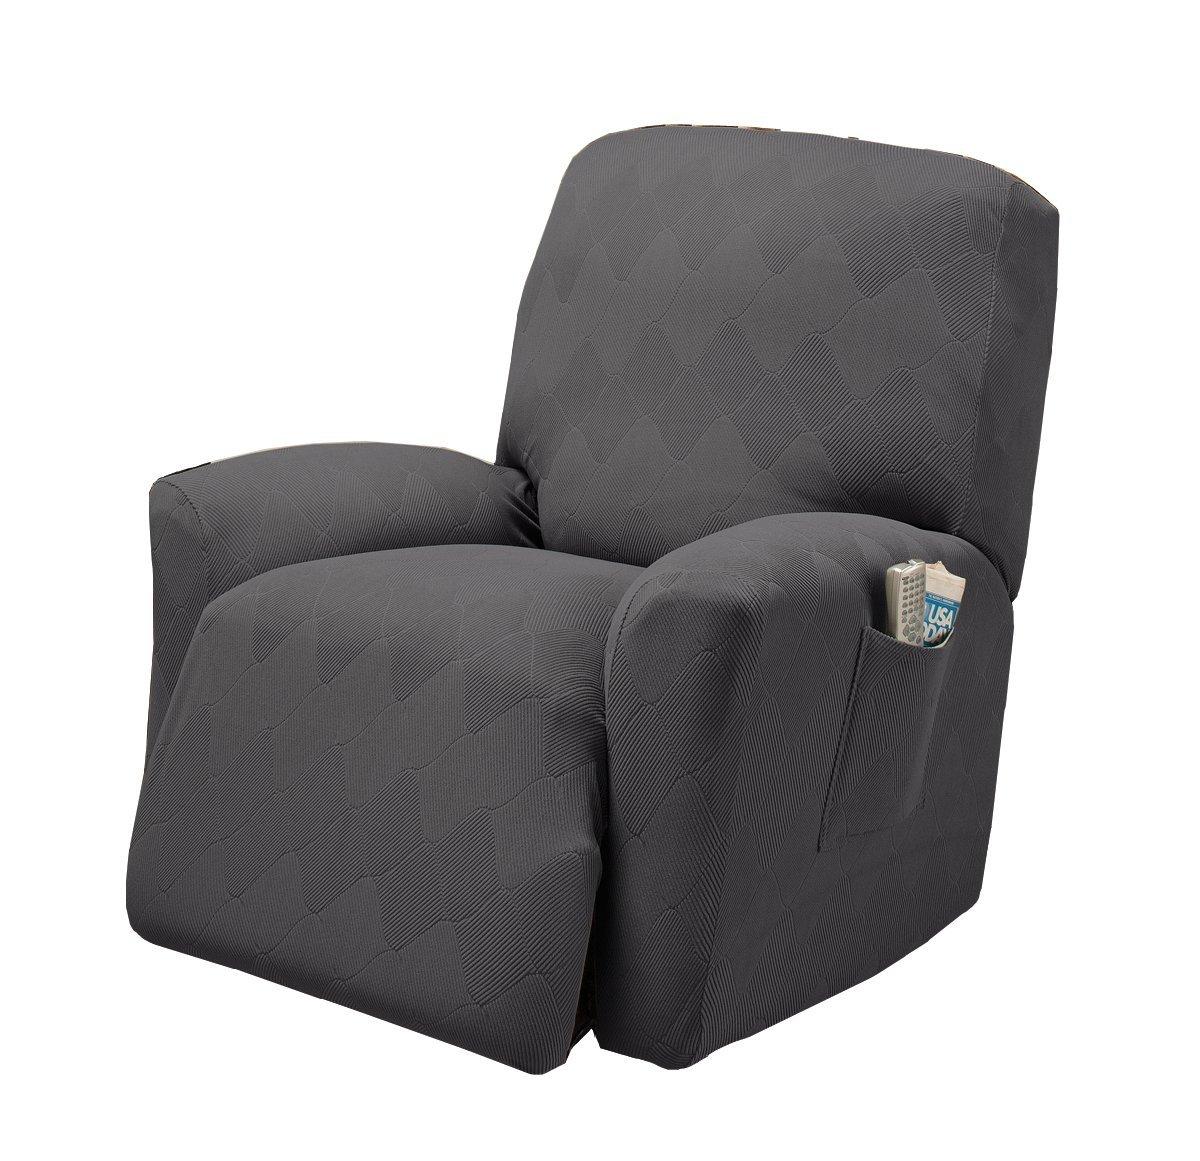 Amazon.com: Grey - Slipcovers / Home Décor: Furniture & Decor